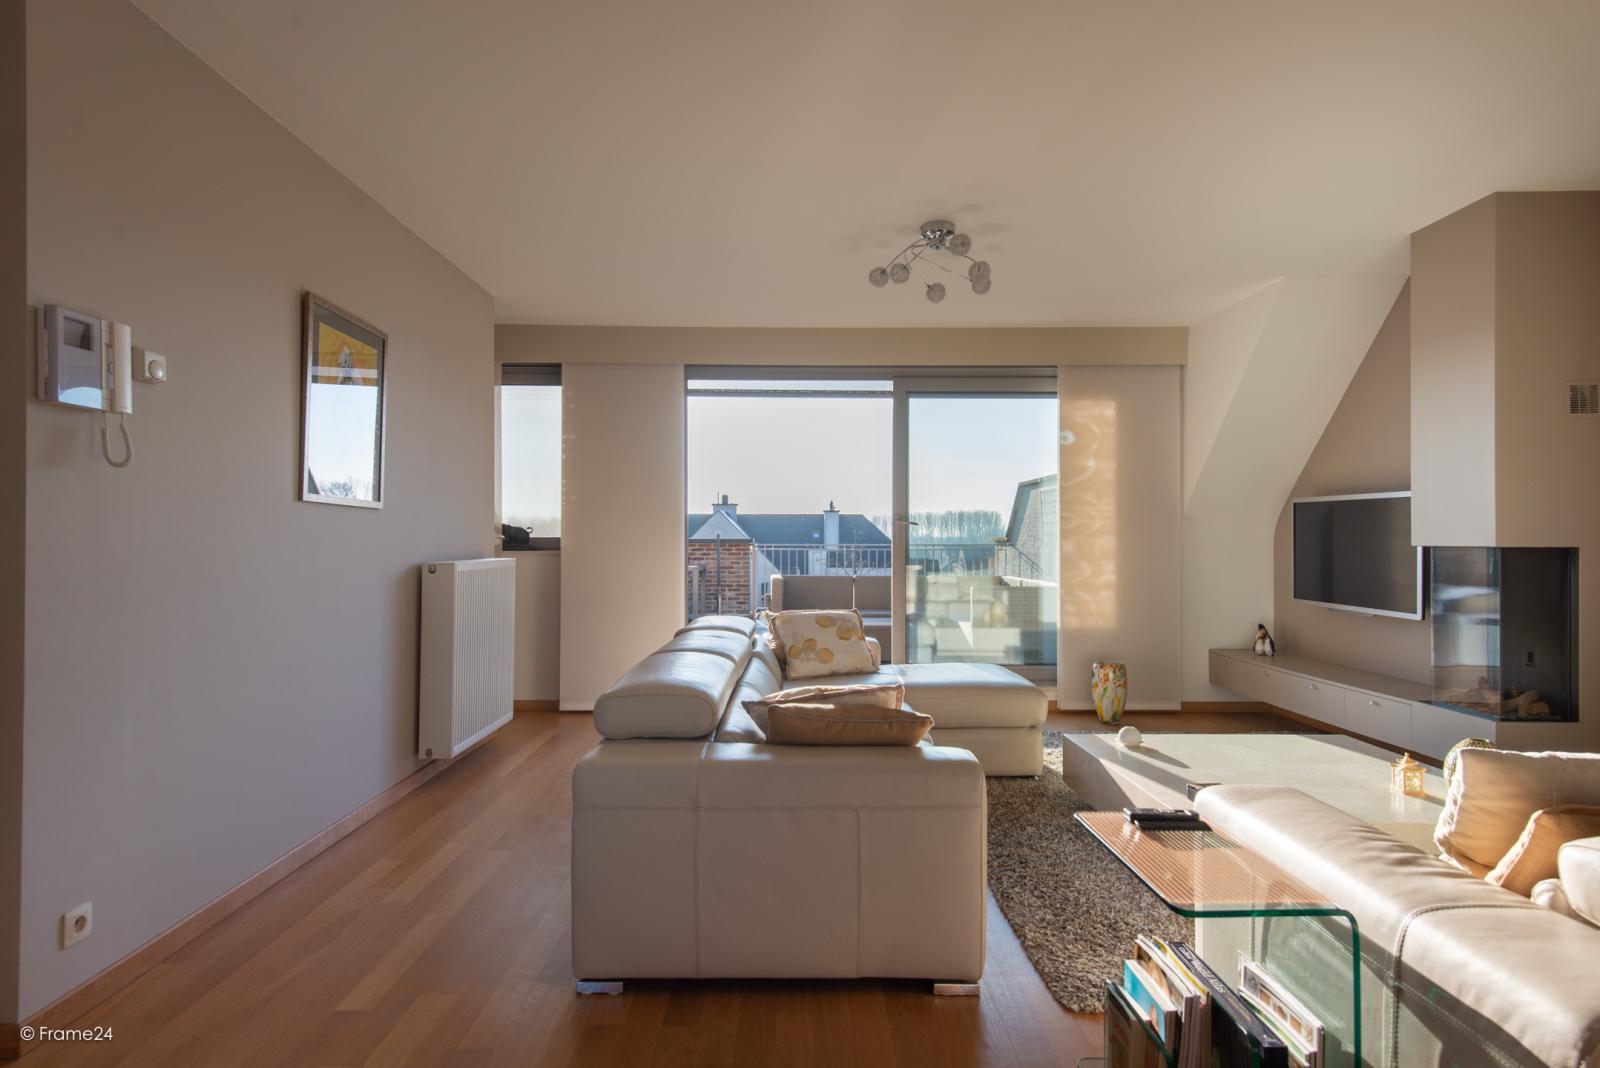 Riant dakappartement (130 m²) met zonnig terras in residentie 'Eyserhof' te Wijnegem! afbeelding 14